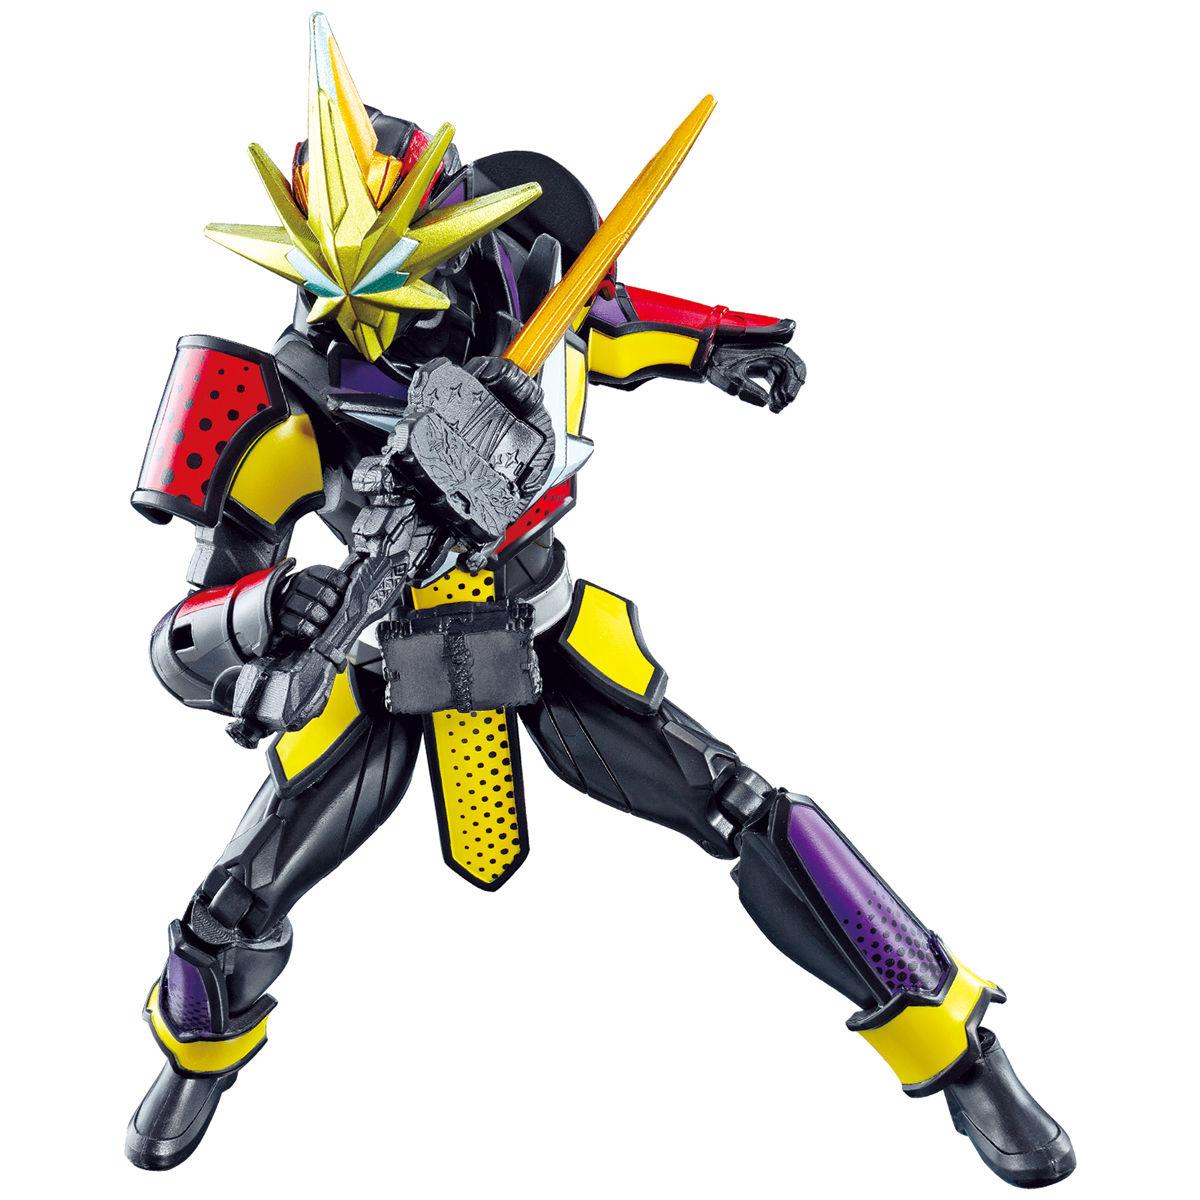 RKF『仮面ライダー最光 最高パーフェクトセット』仮面ライダーセイバー 可変可動フィギュア-004